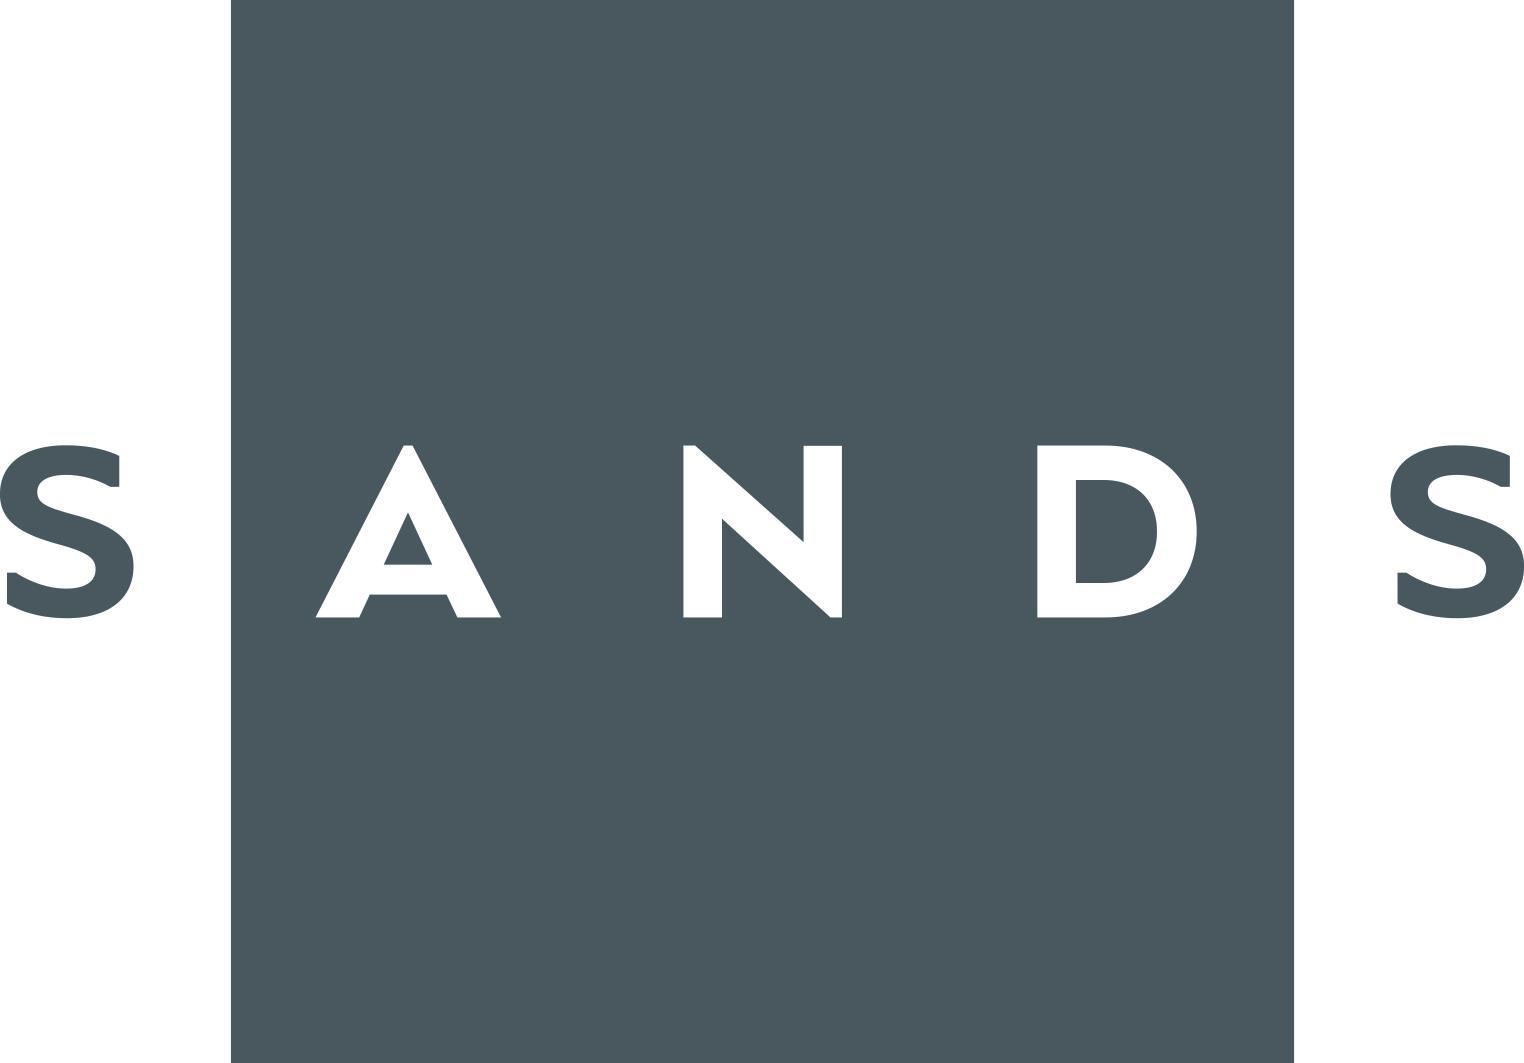 905 SANDS gr%c3%a5logo